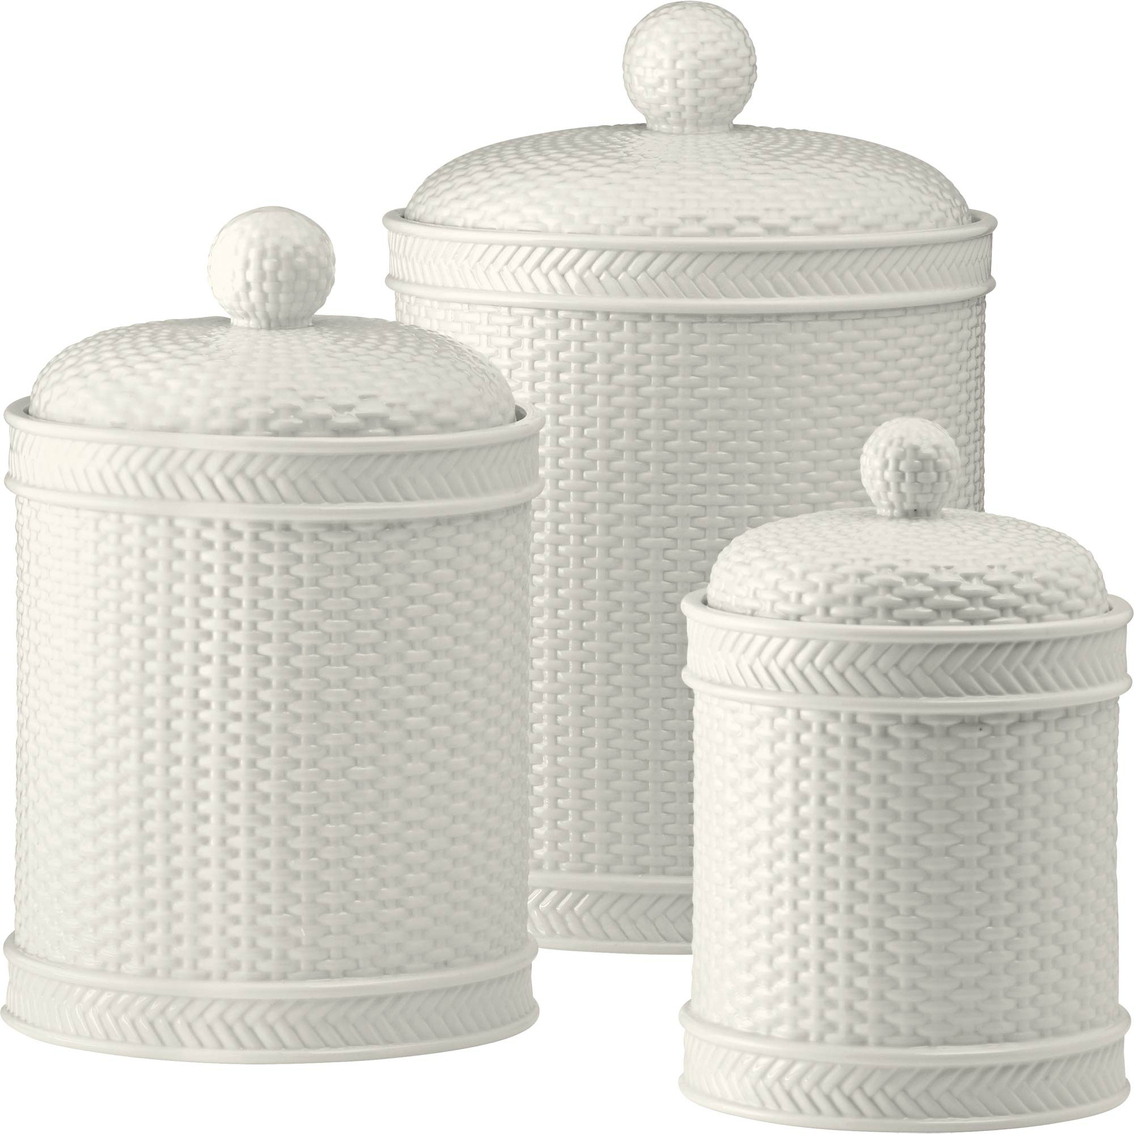 3550  sc 1 st  ShopMyExchange.com & Martha Stewart Collection Whiteware Basketweave 3 Pc. Canister Set ...